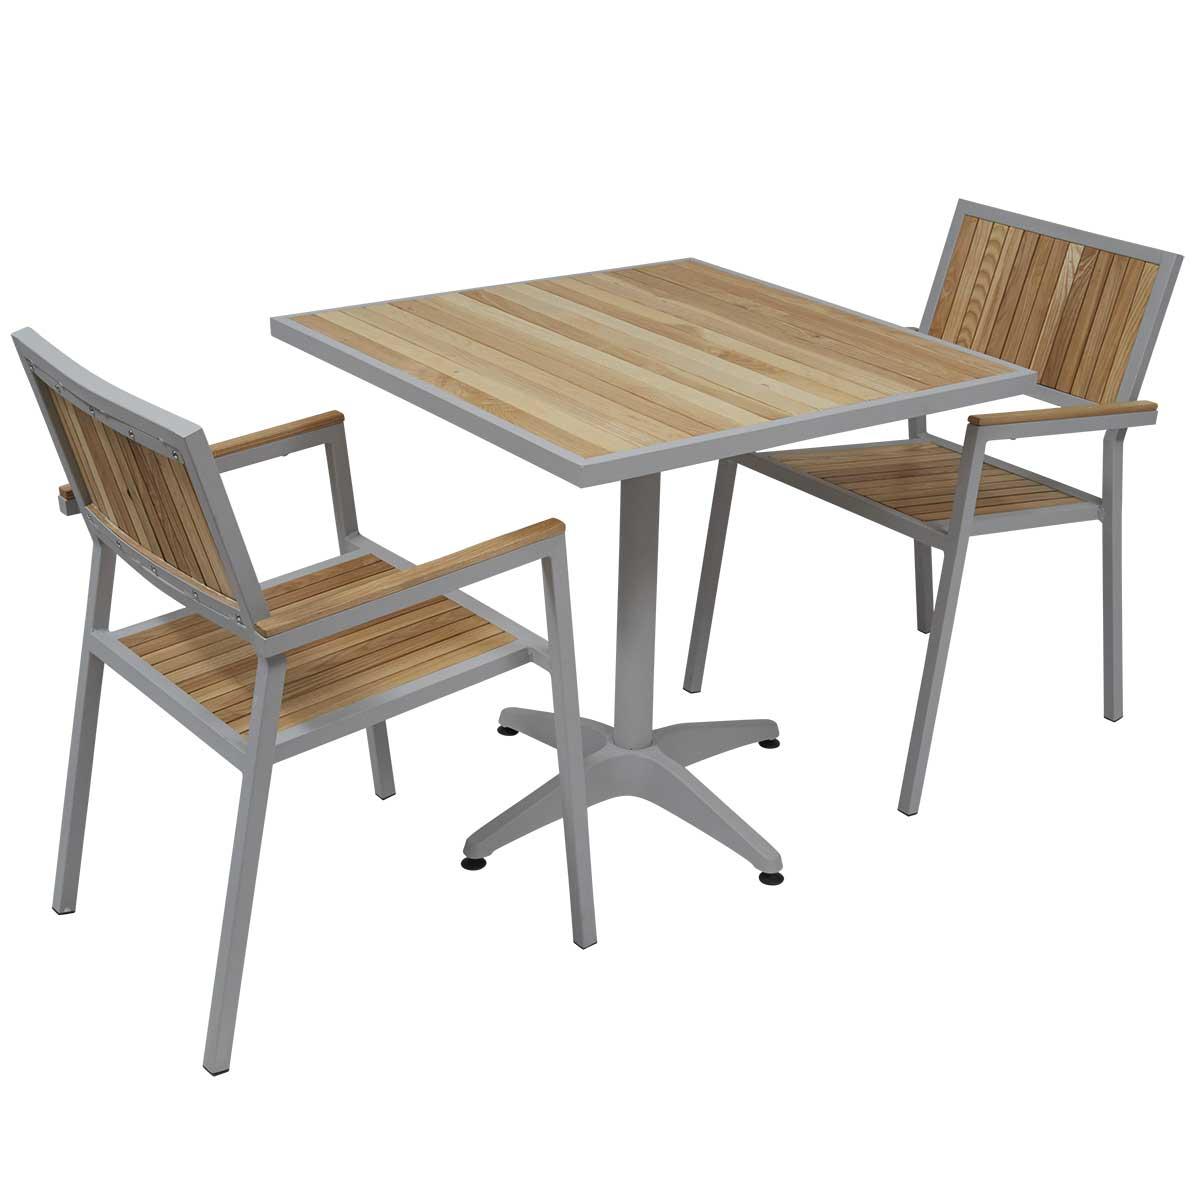 Table Bistrot Jardin Best Of Table Terrasse Pas Cher Of 36 Inspirant Table Bistrot Jardin